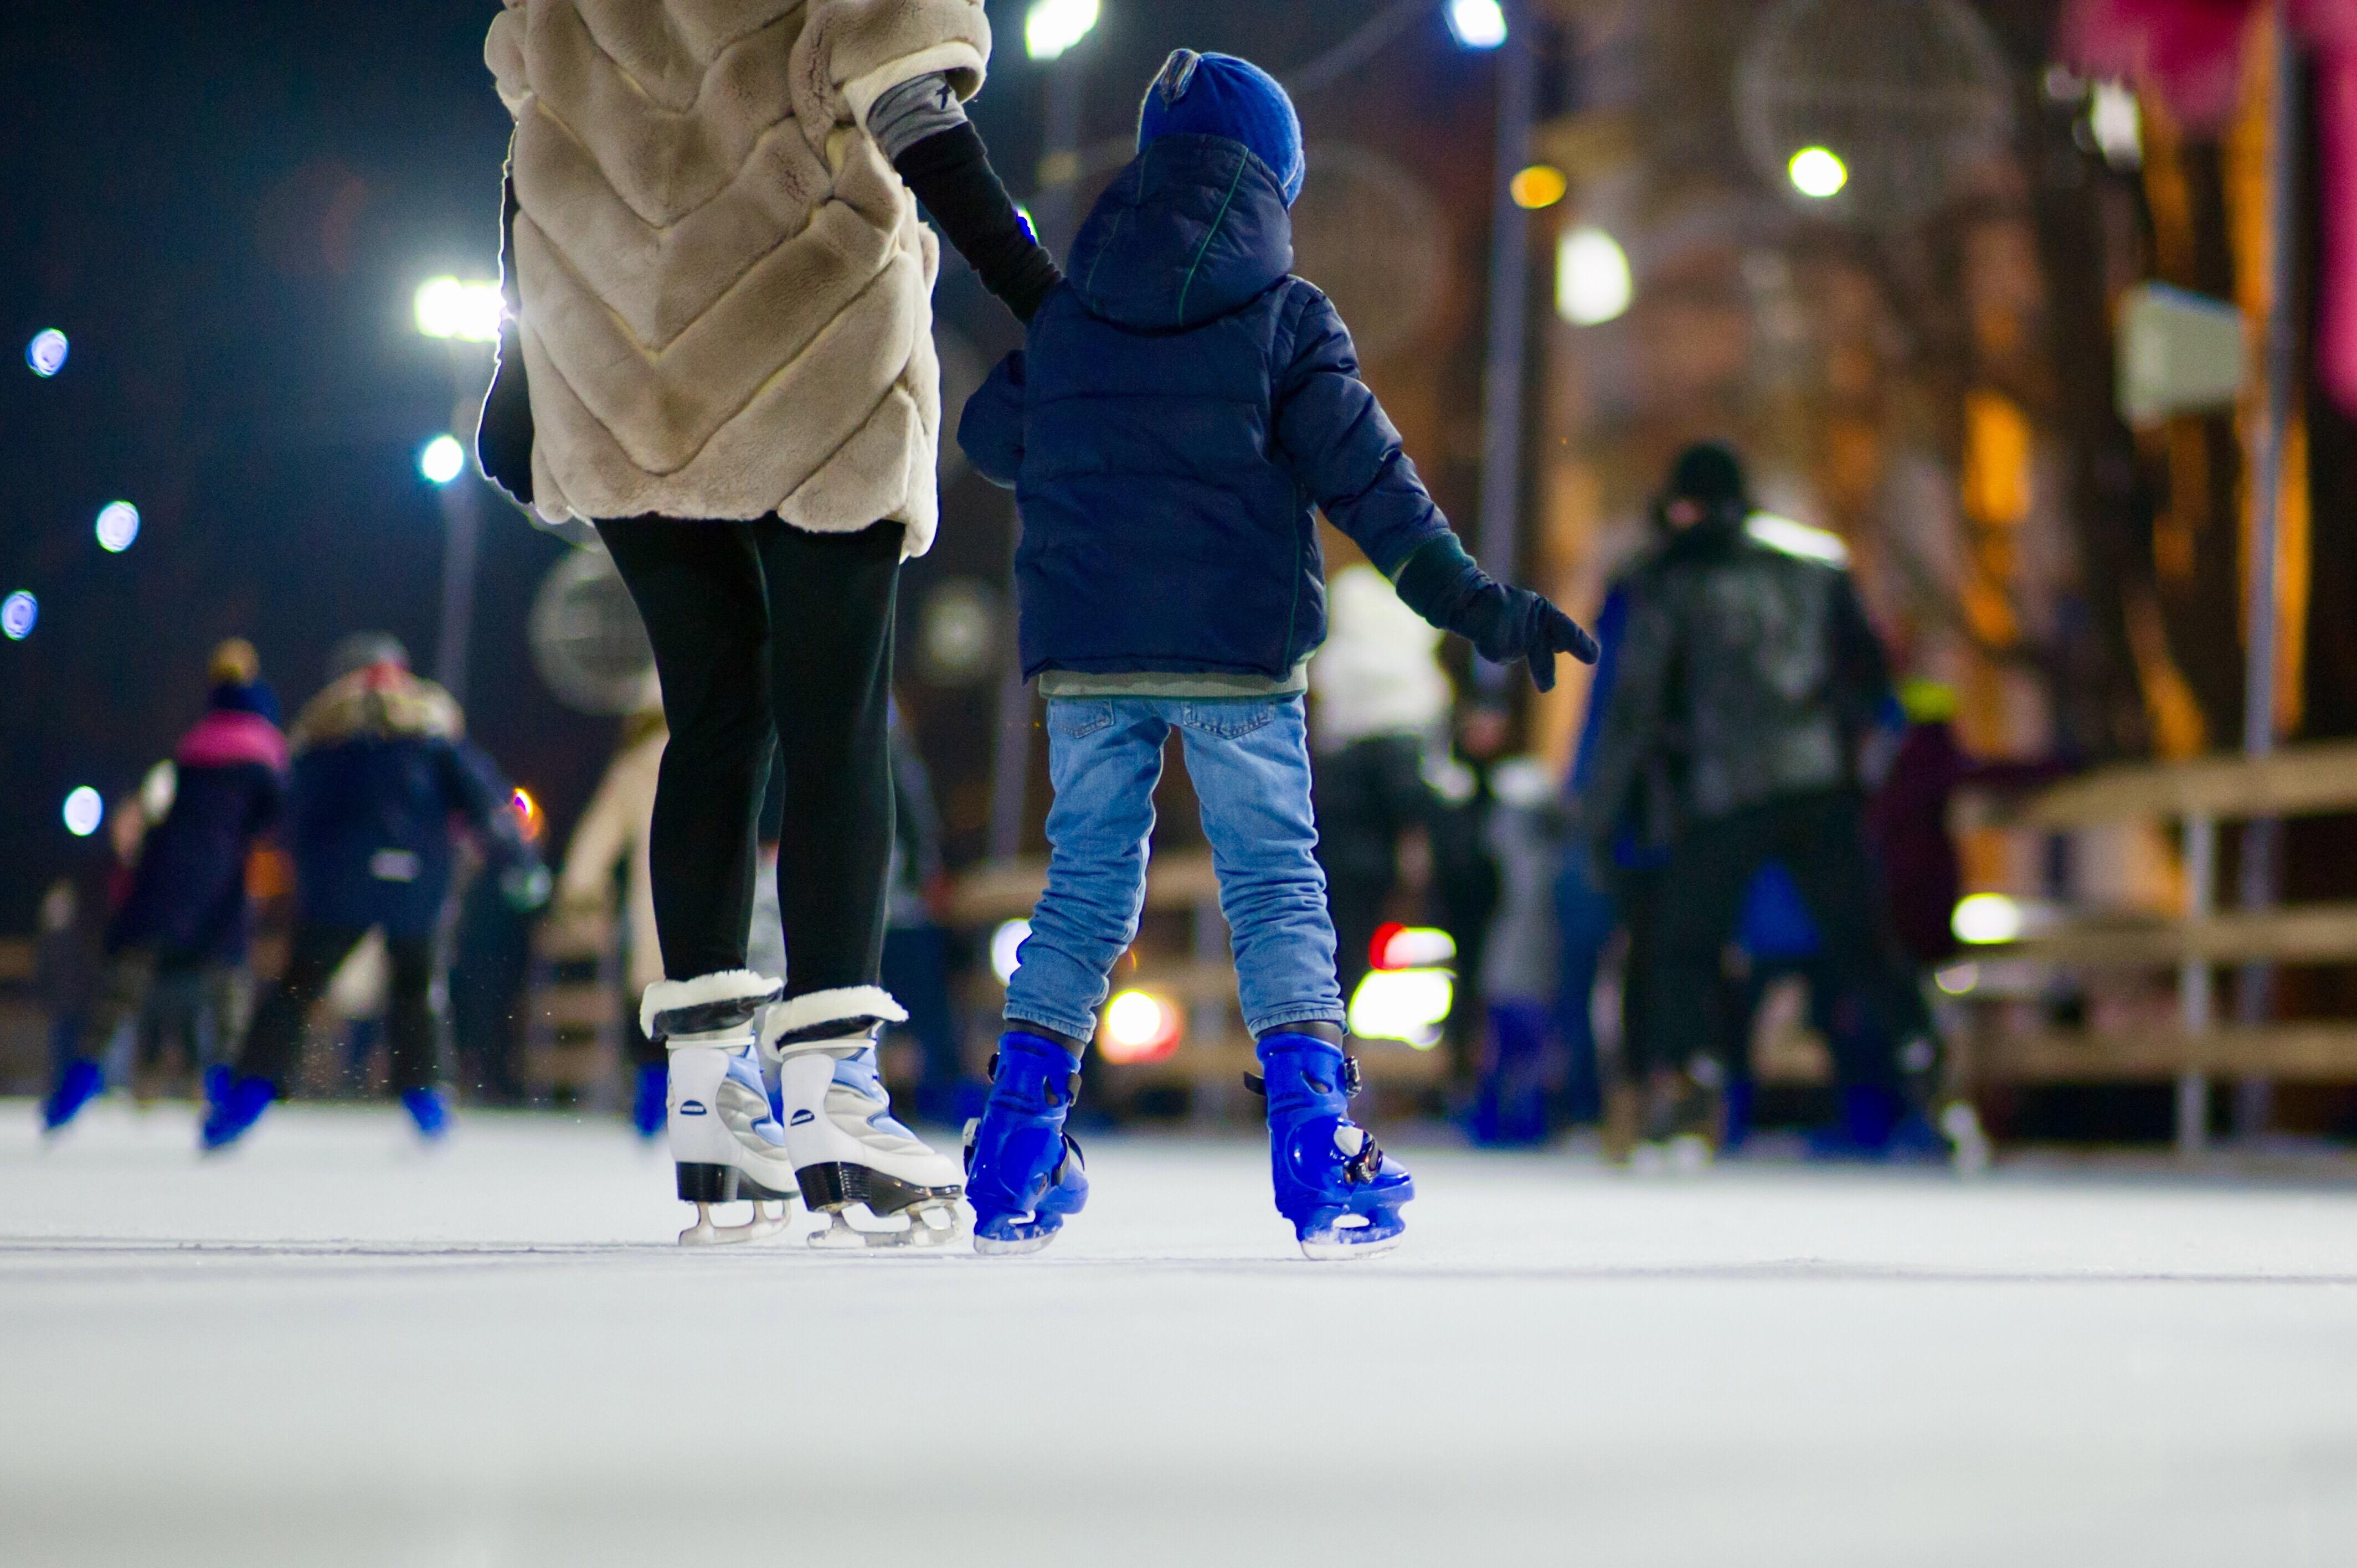 Ice + Lights: The Winter Village at Cameron Run